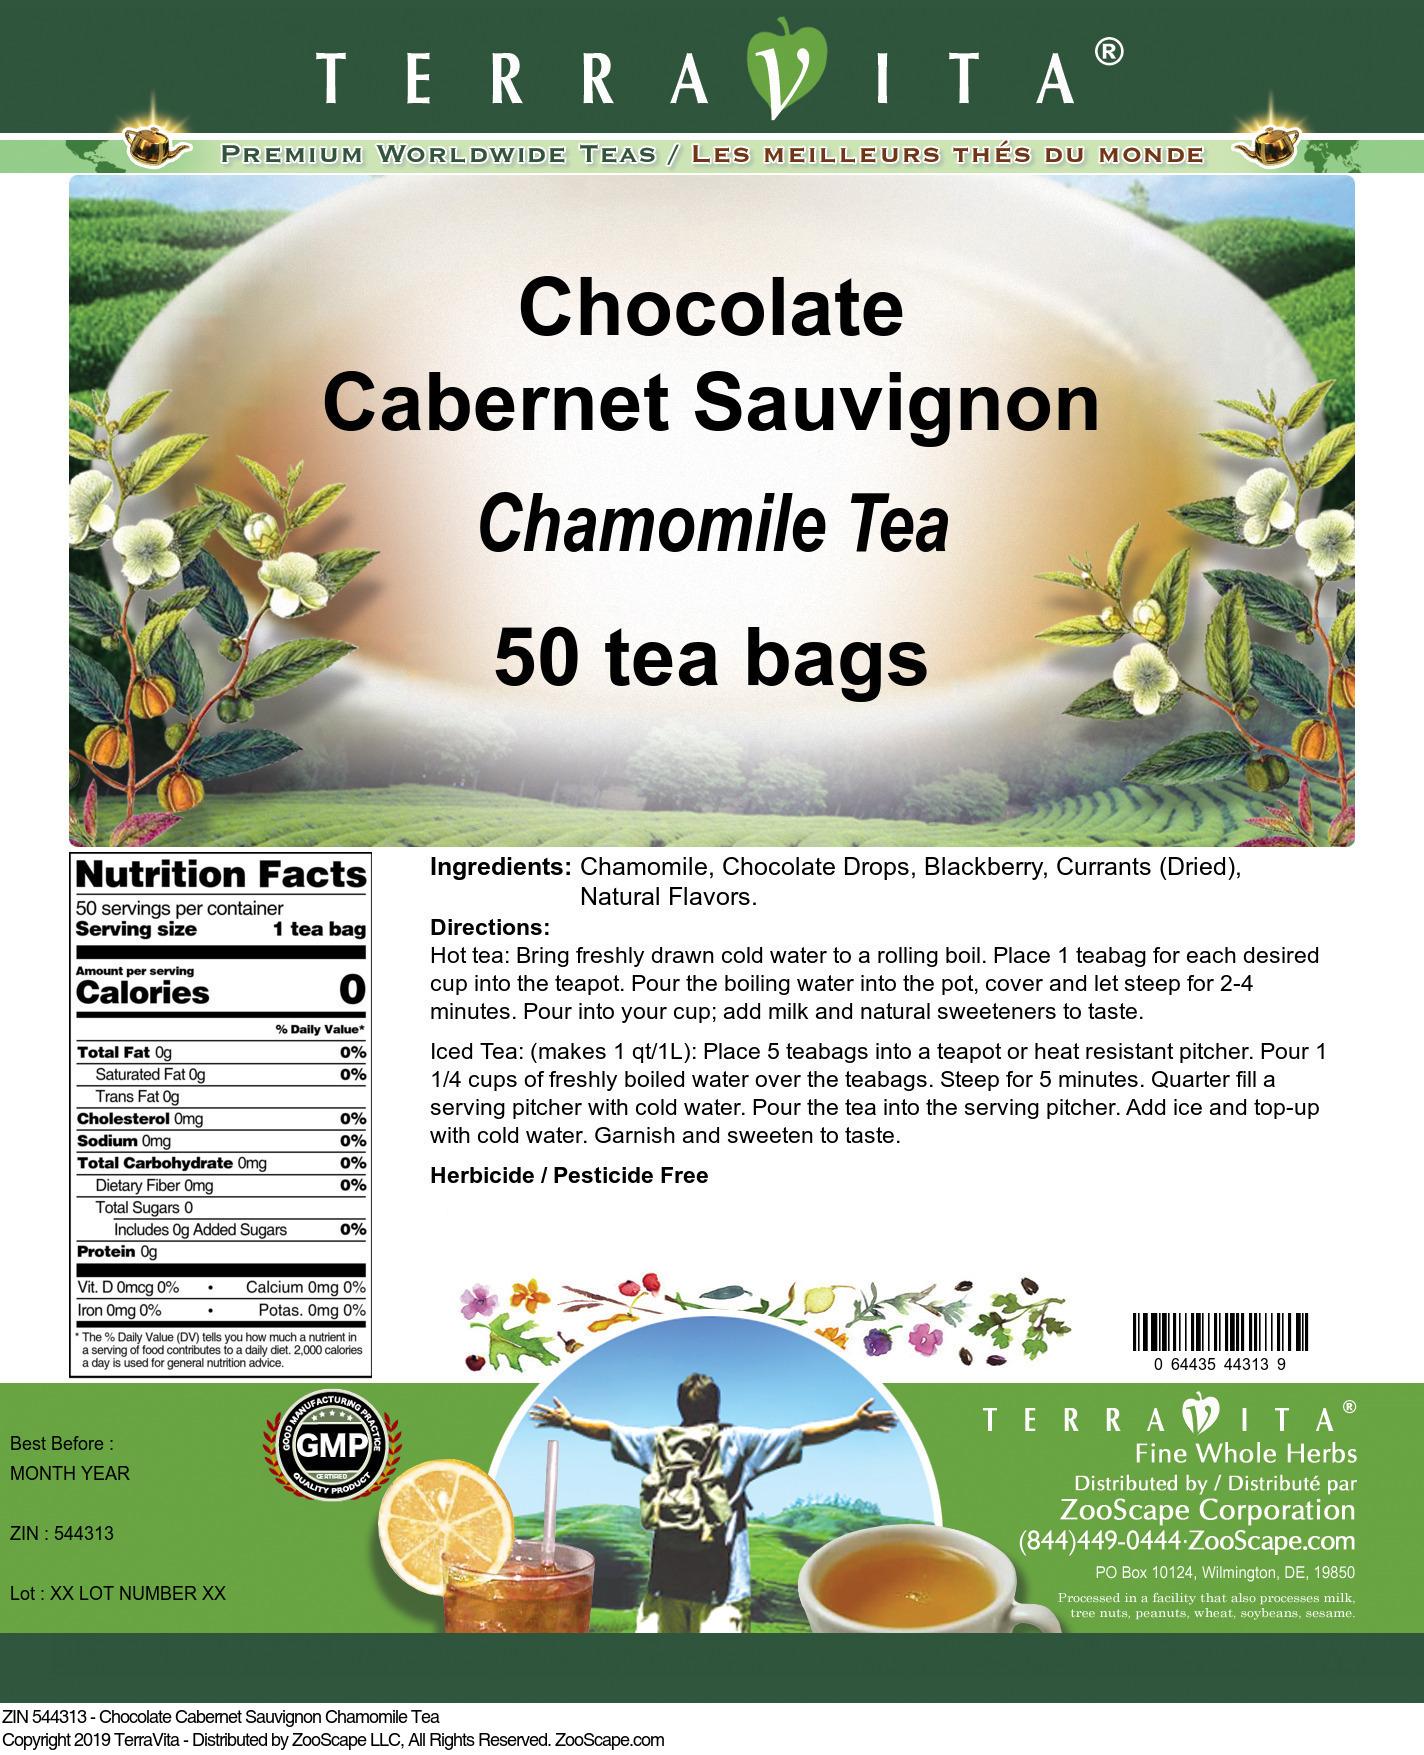 Chocolate Cabernet Sauvignon Chamomile Tea